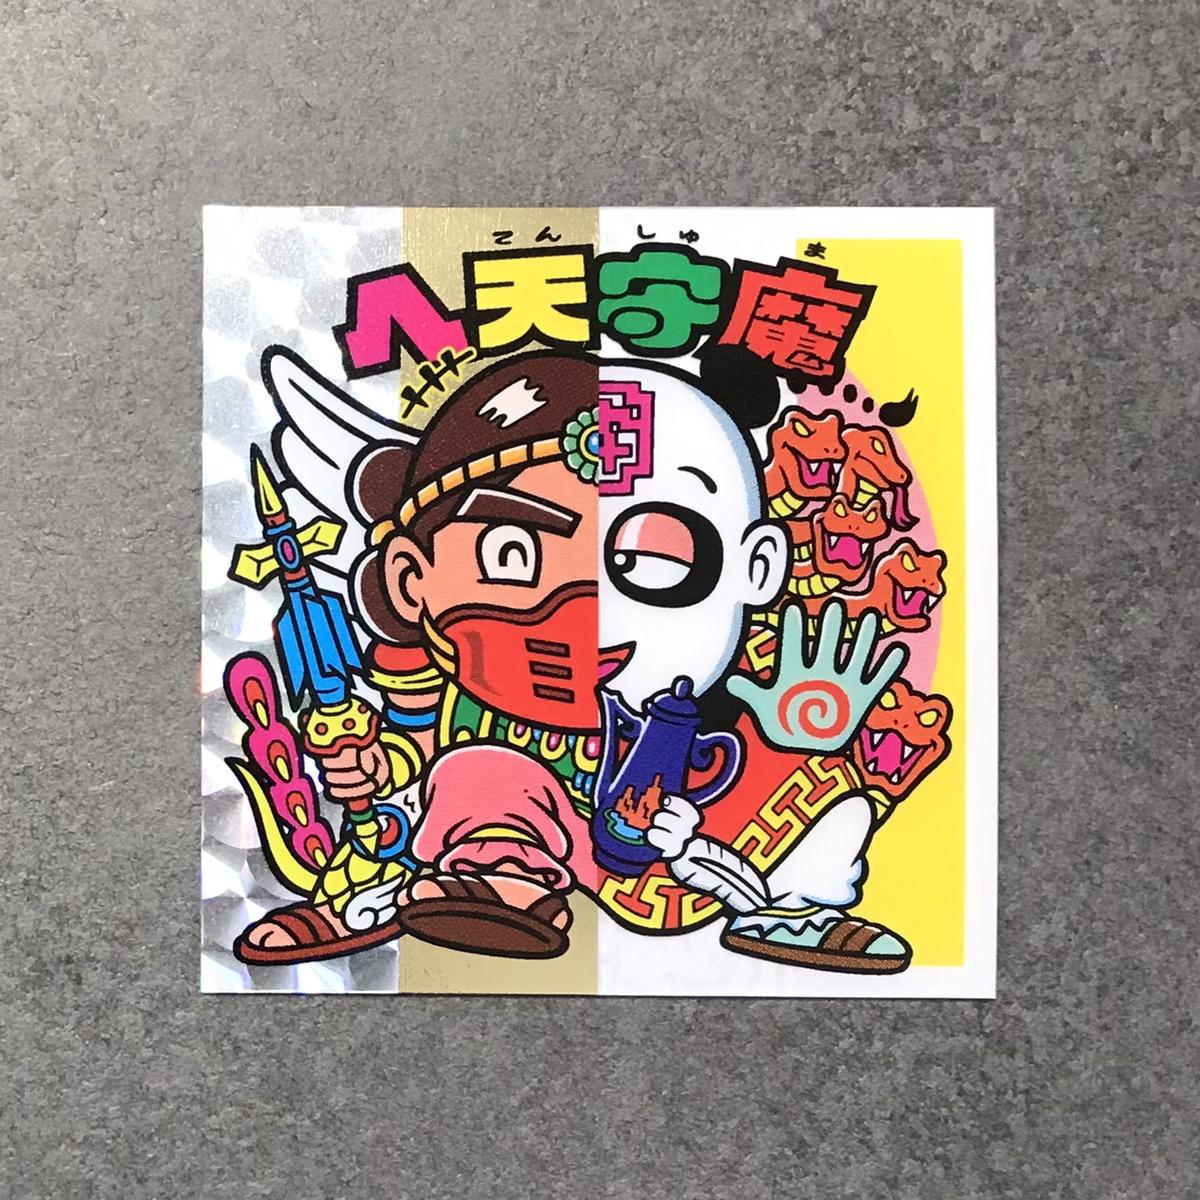 6月29日21:00新作シール発売!!!